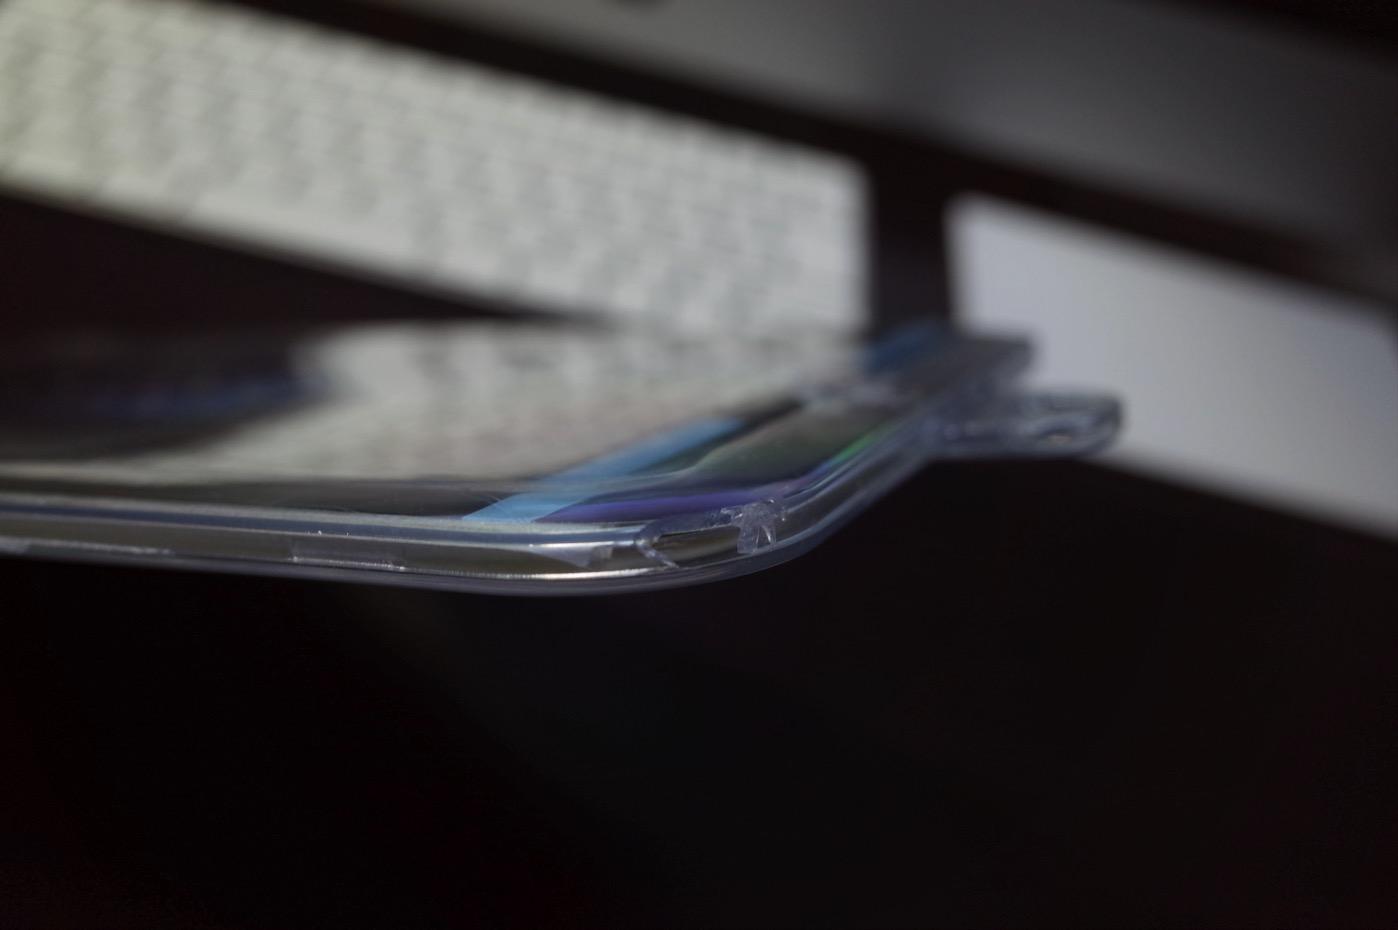 RoiCeil 液晶保護強化ガラスフィルム 硬度9H 超薄0.3mm 2.5D ラウンドエッジ加工-4